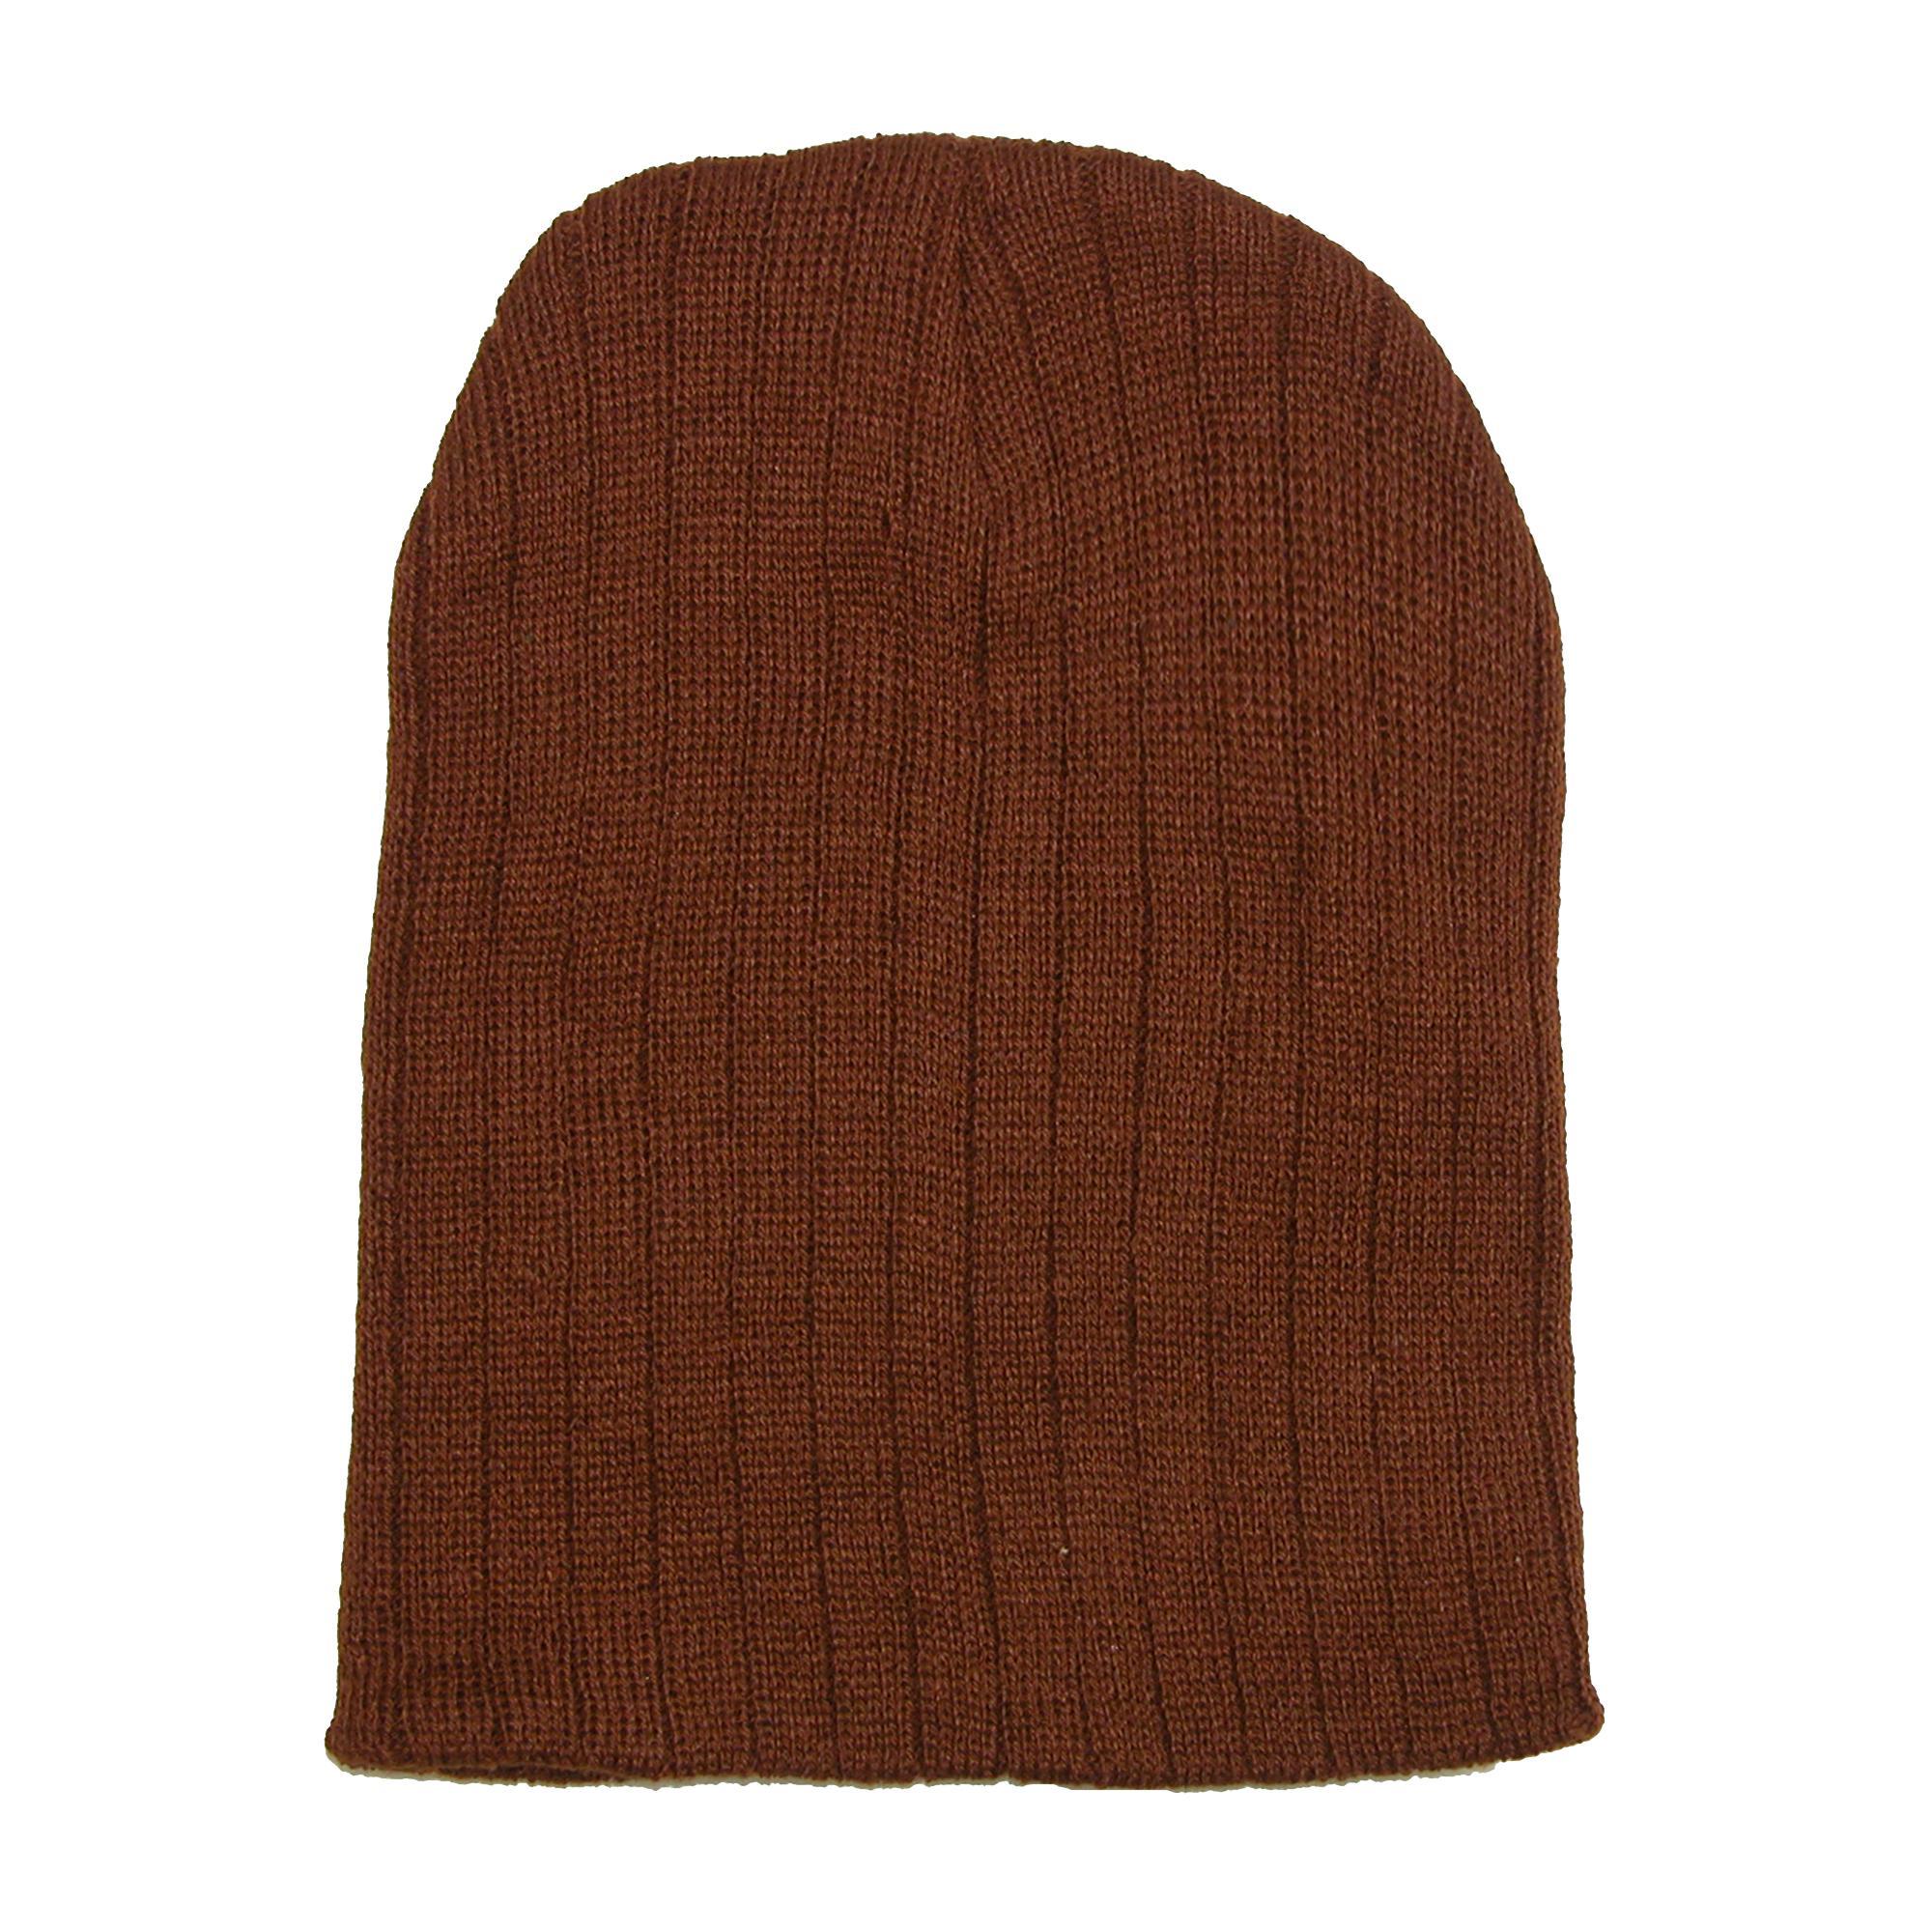 Winter Stocking Cap 6